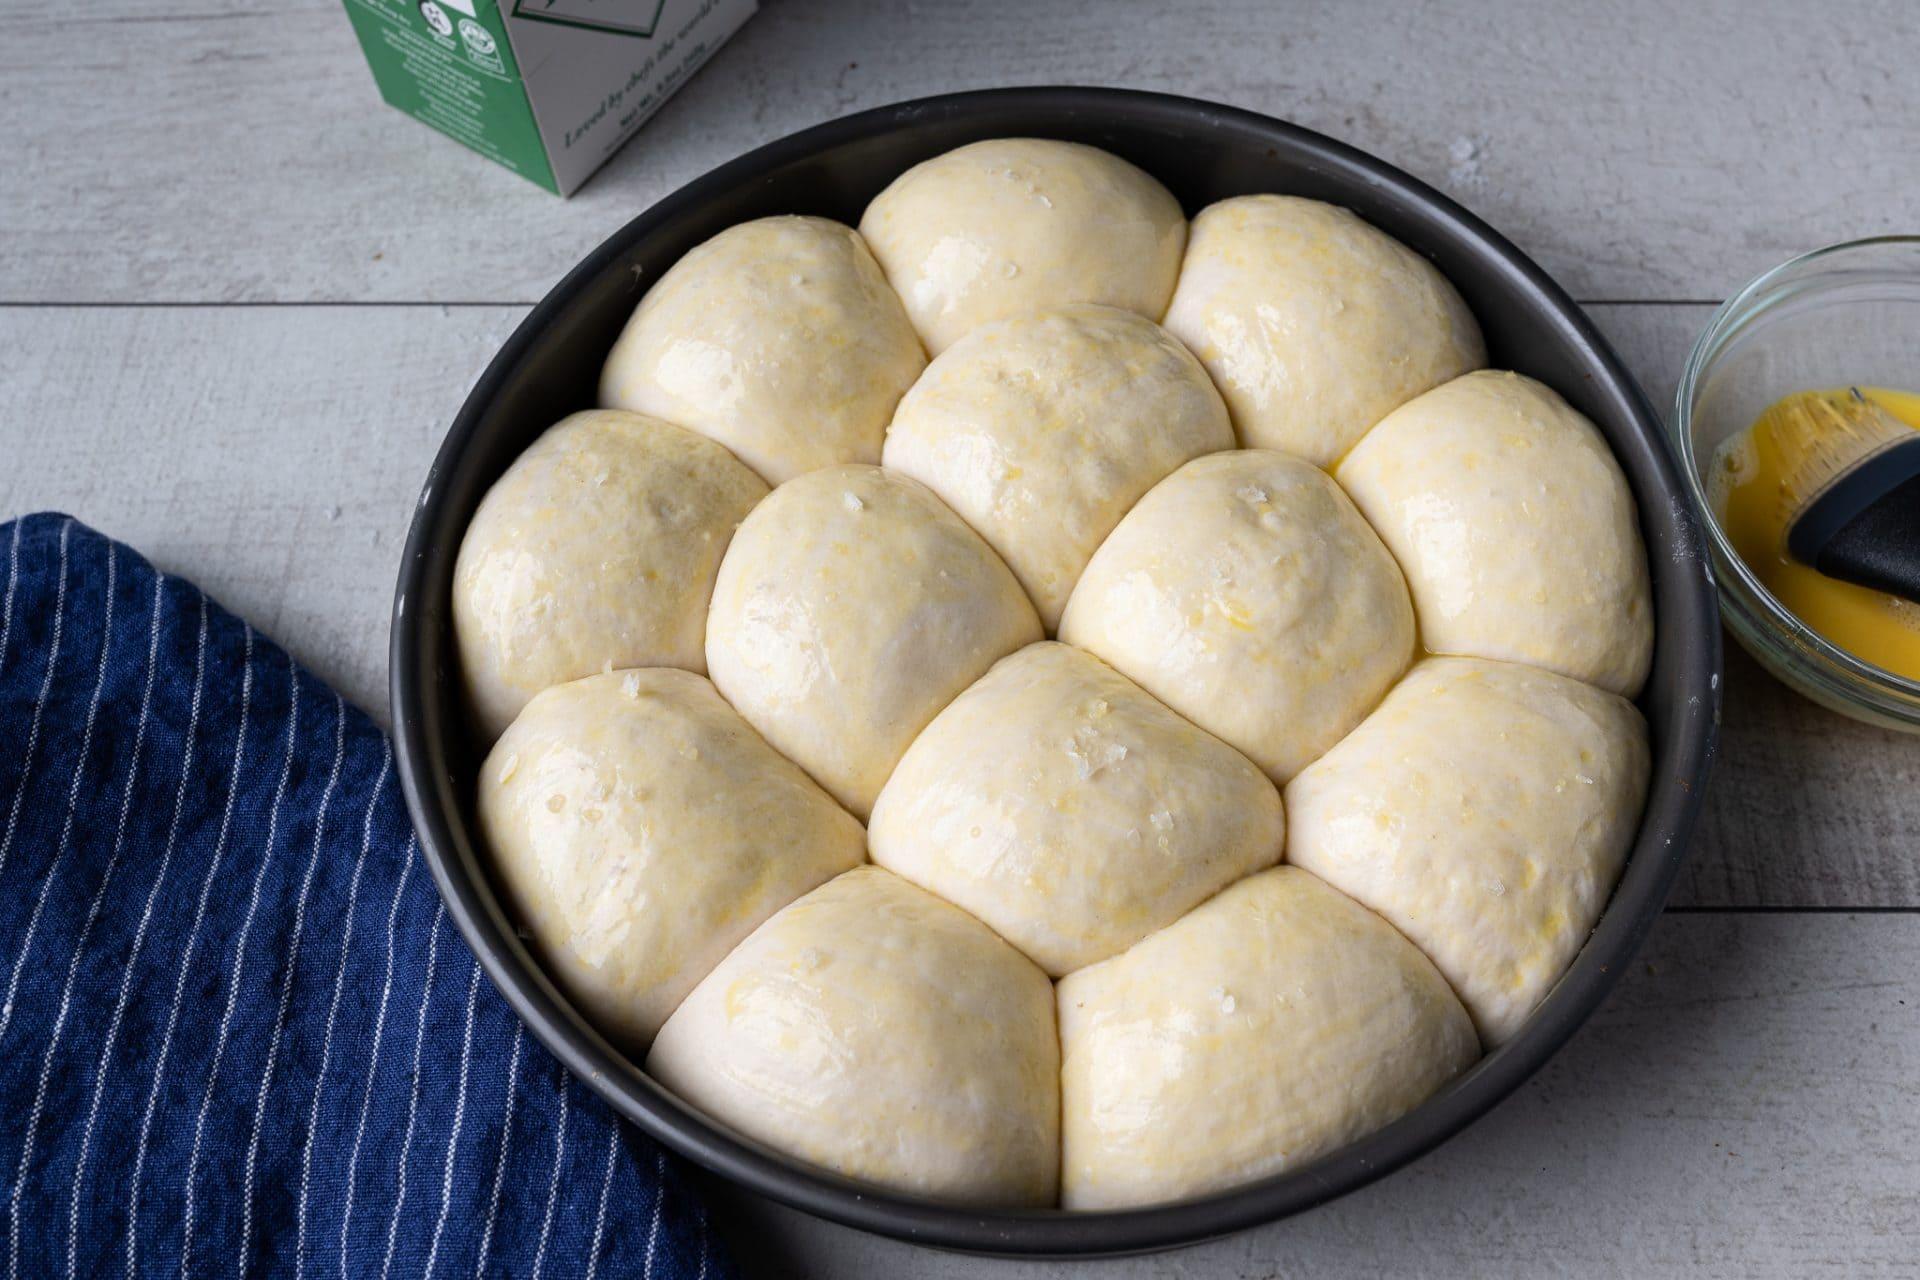 Super soft sourdough dinner rolls ready for the oven